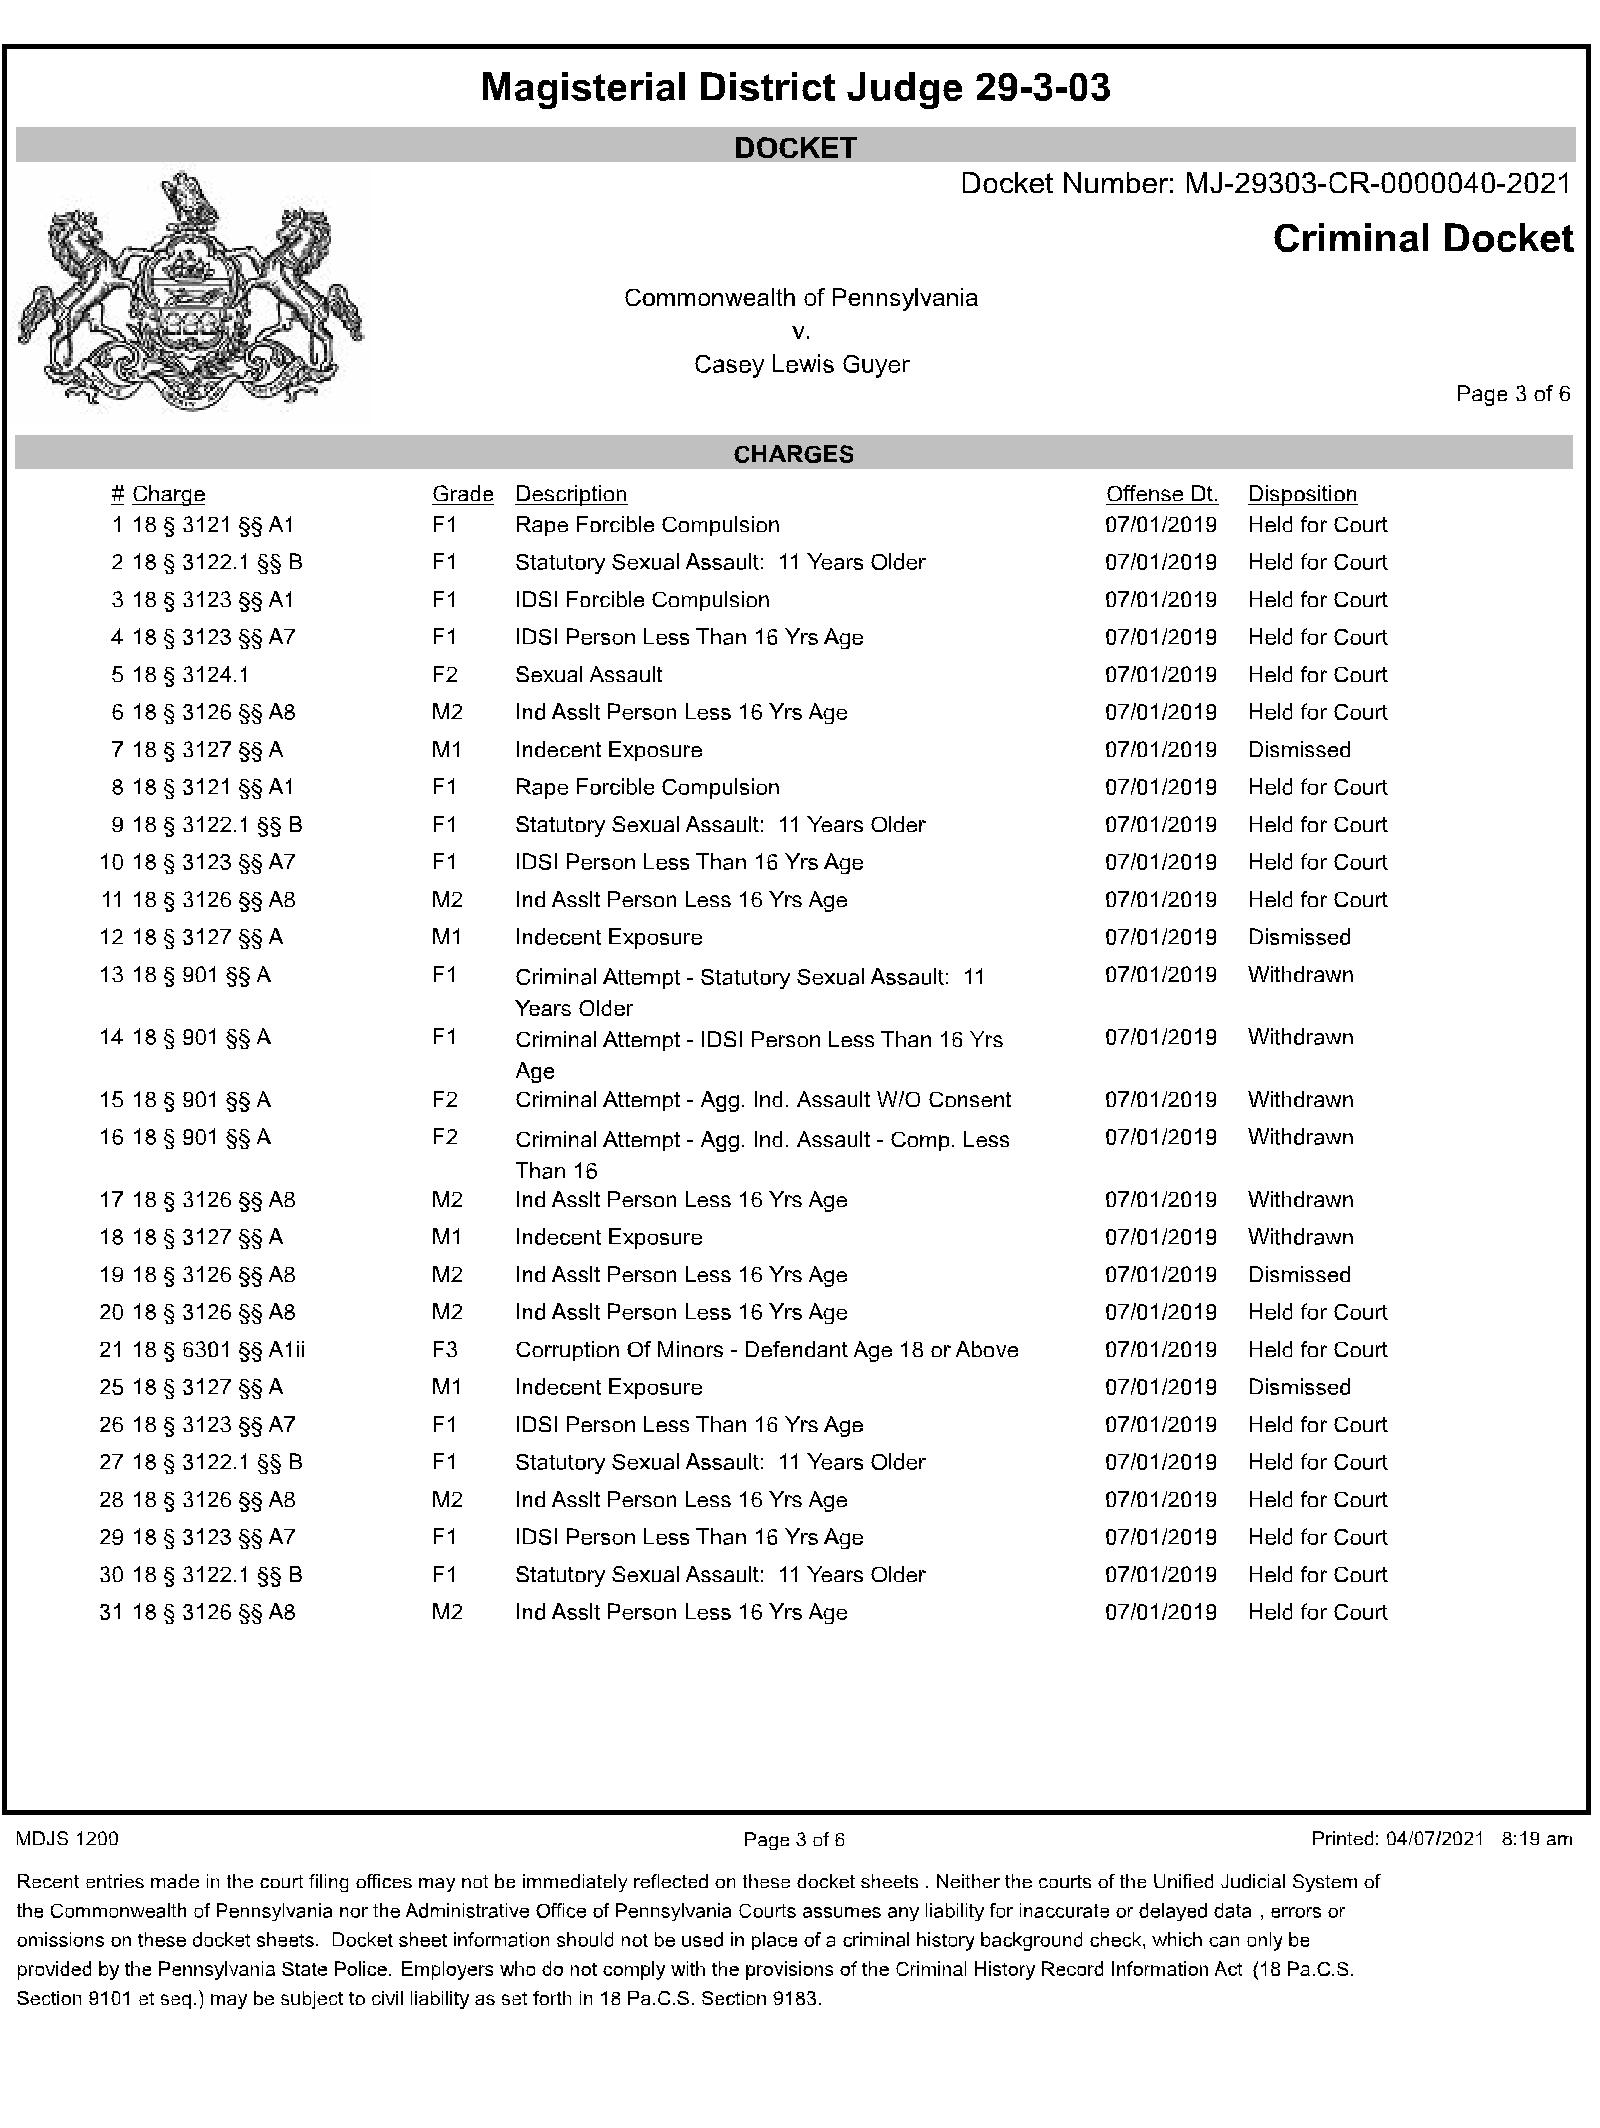 Copy of 2021-04-07_7-23-253.png